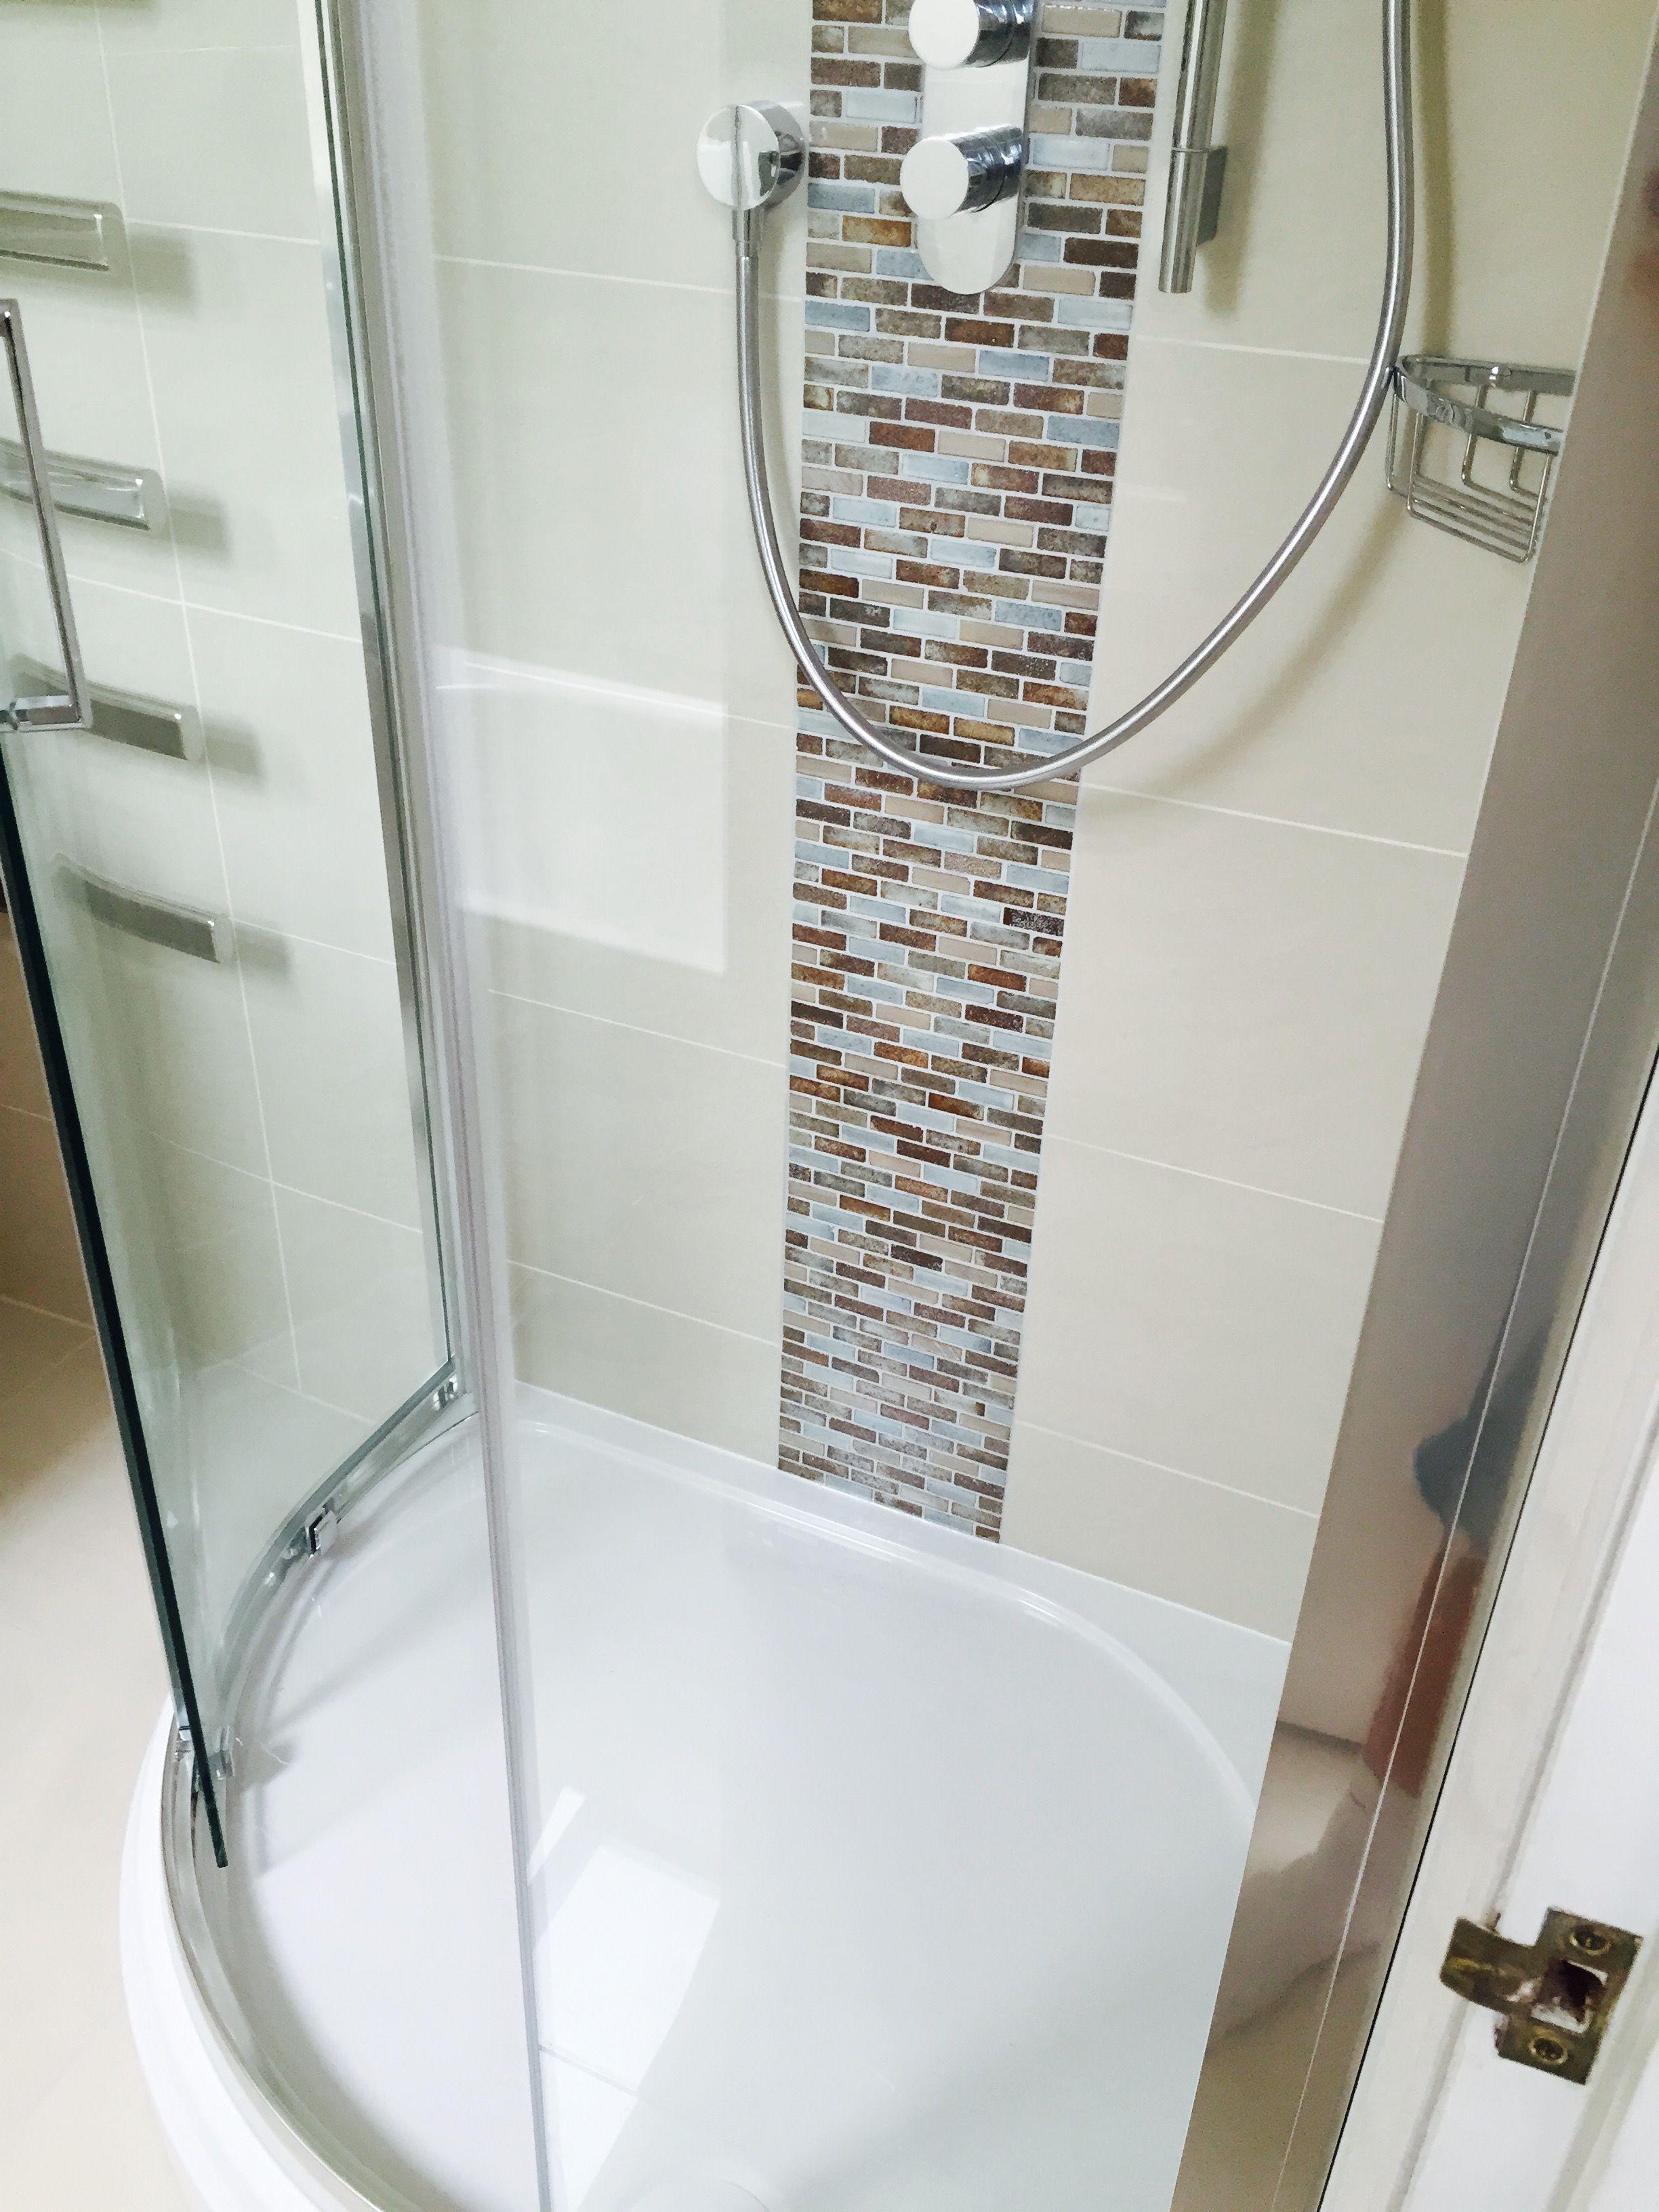 Pin by DPP Construction on Kitchens u Bathrooms Pinterest